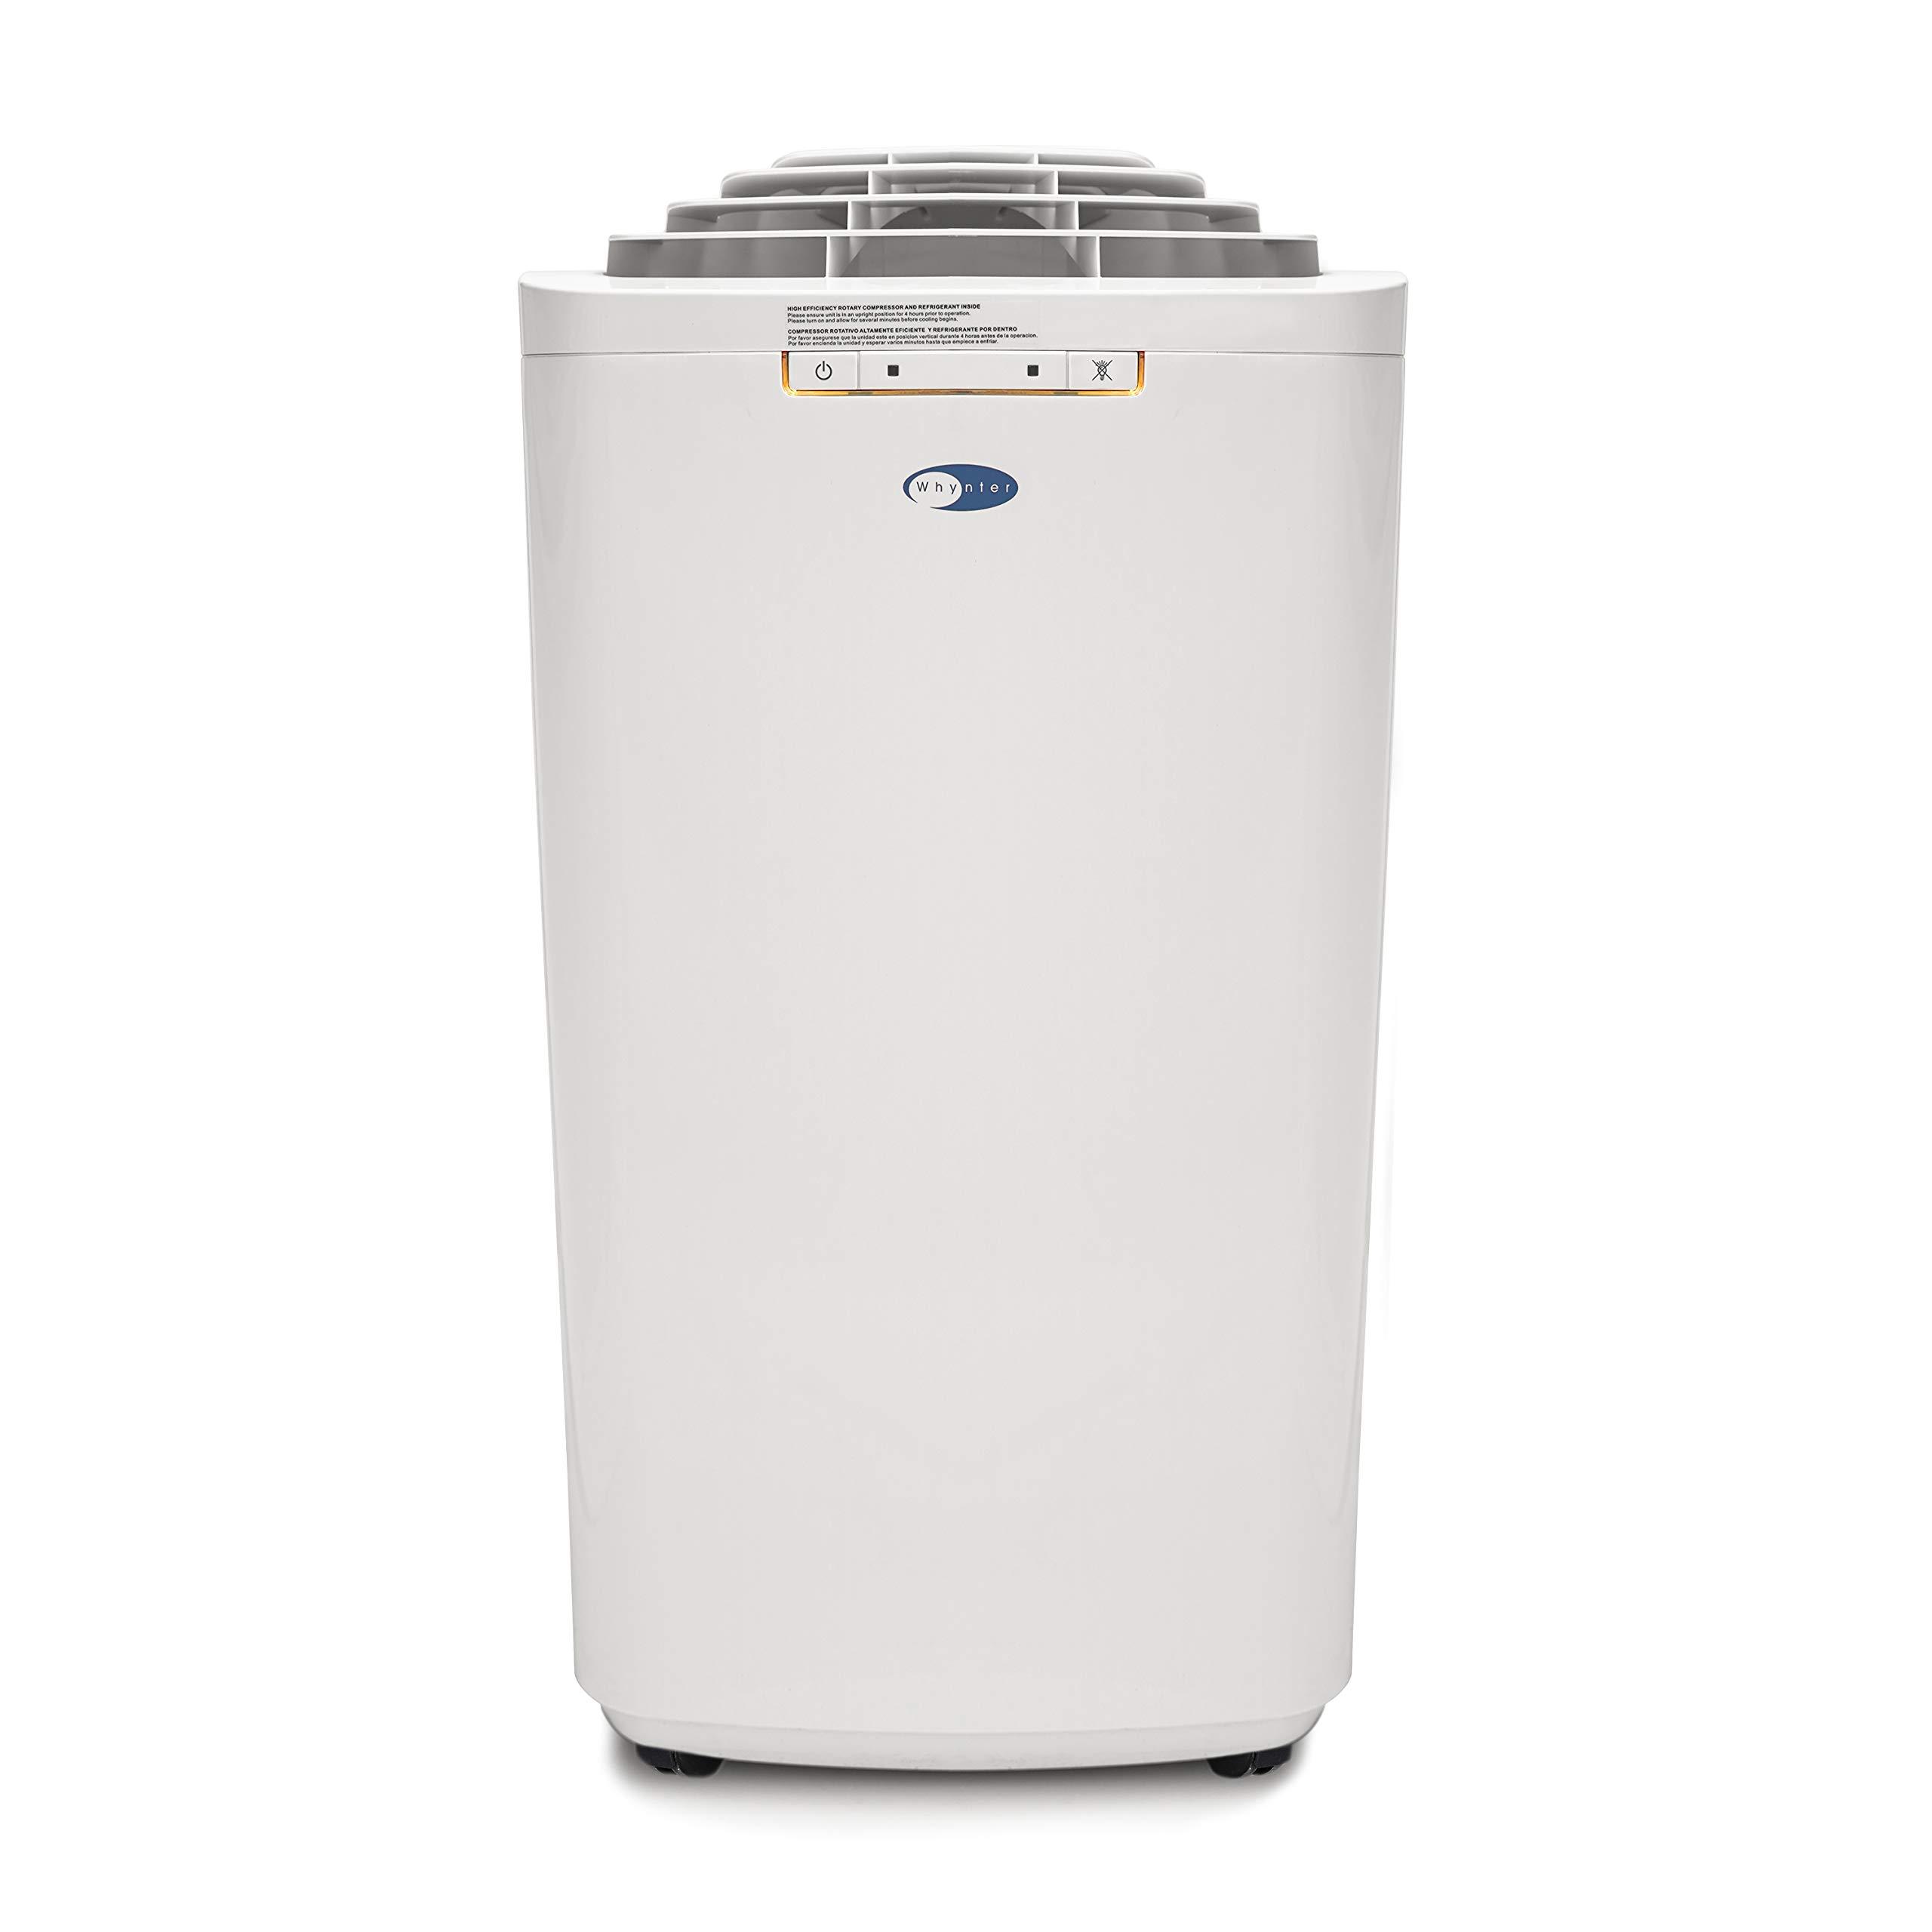 ARC-110WD Whynter 11,000 BTU Dual Hose Portable Air Conditioner